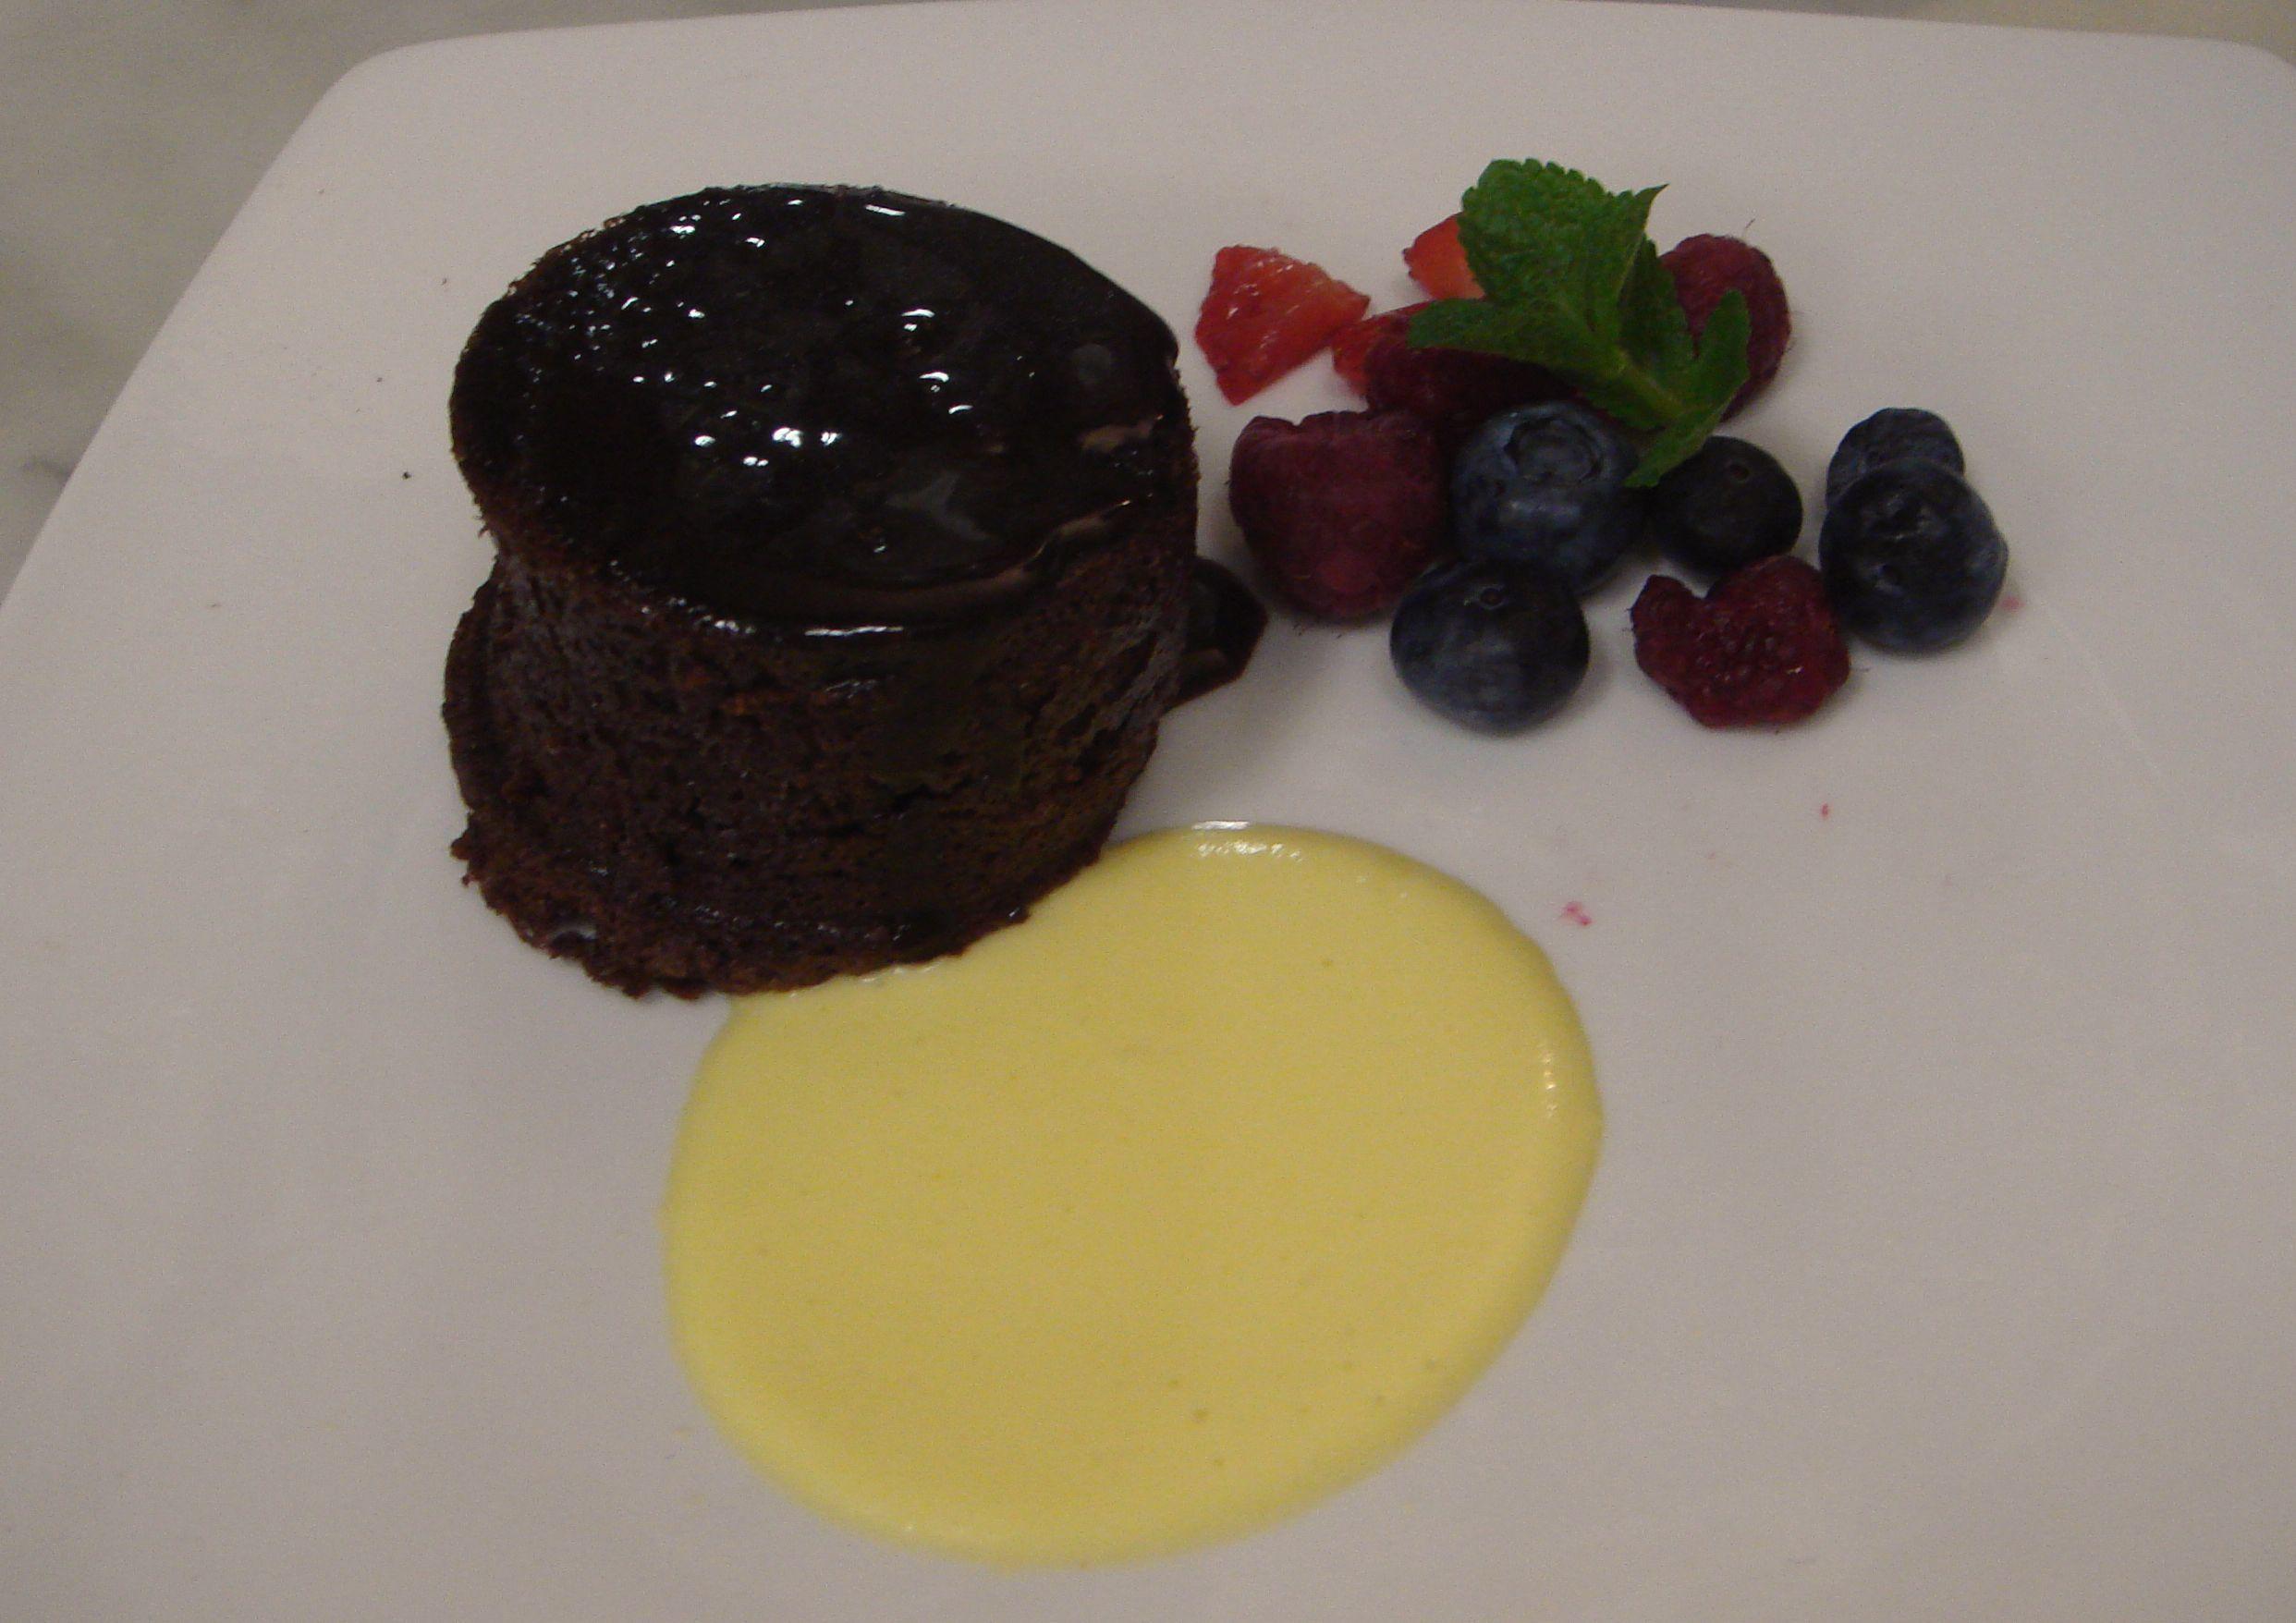 Chocolate and sauvignon italian cake recipe